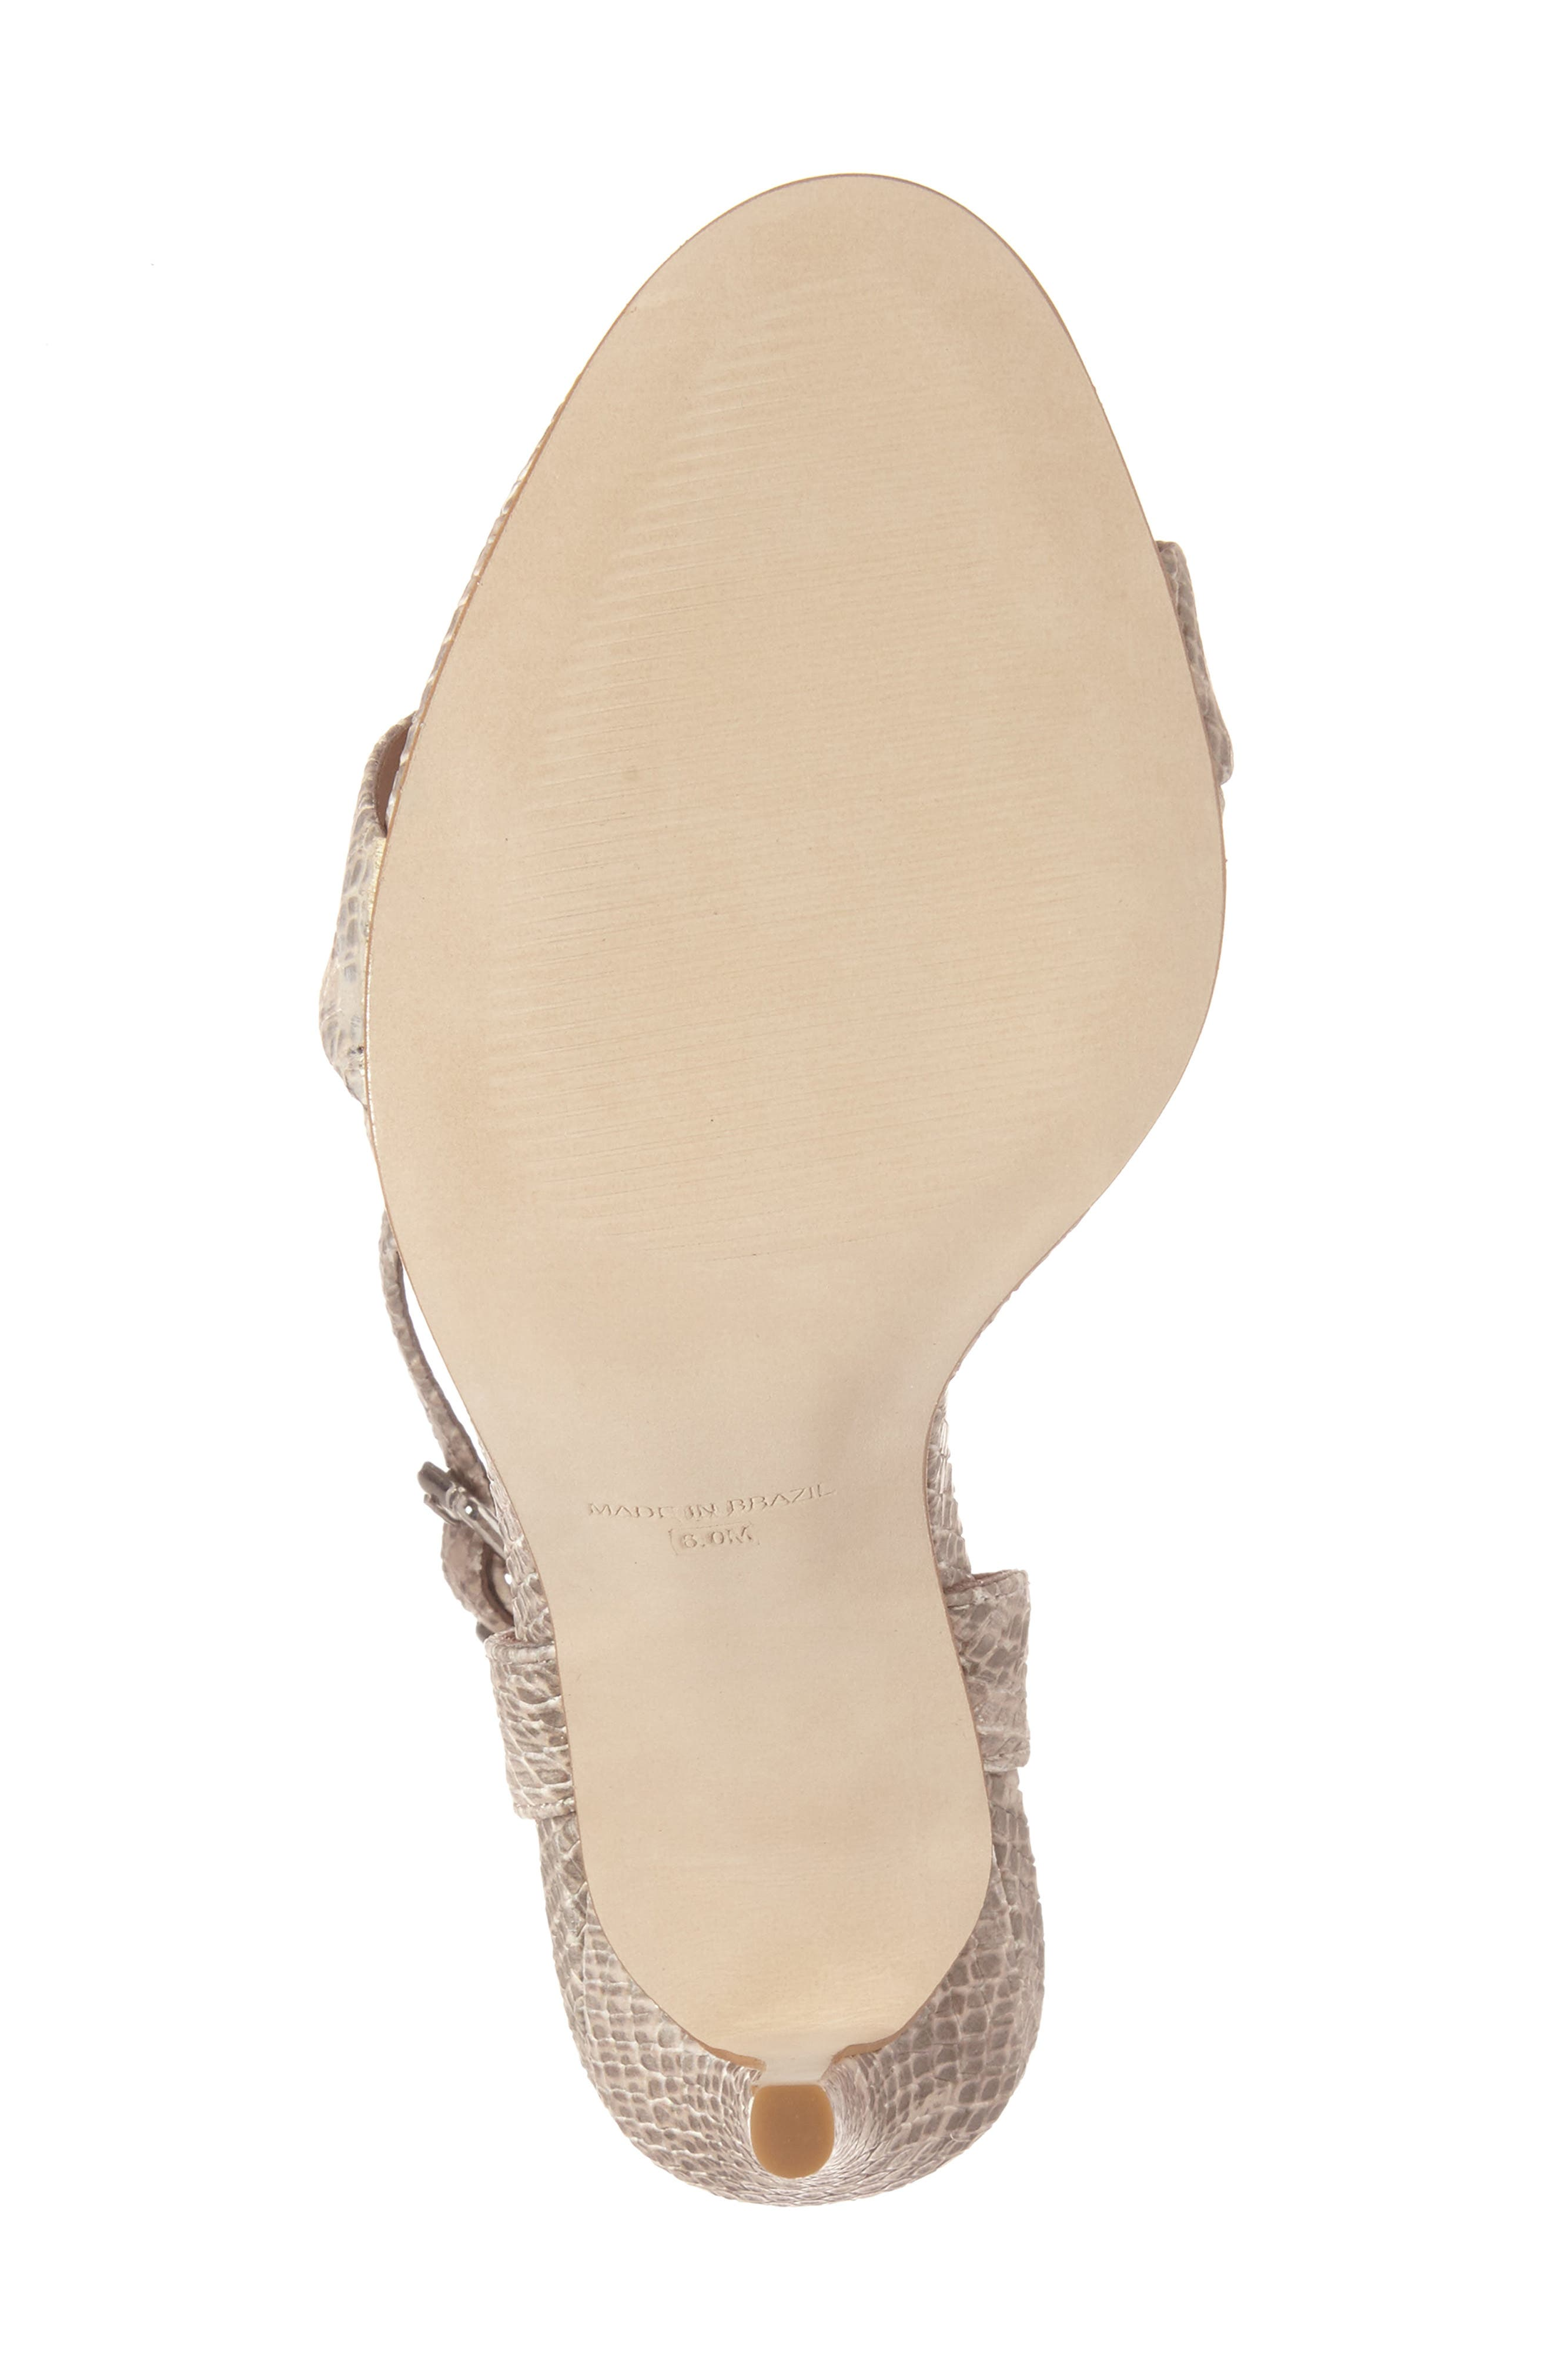 Landen Ankle Strap Sandal,                             Alternate thumbnail 94, color,